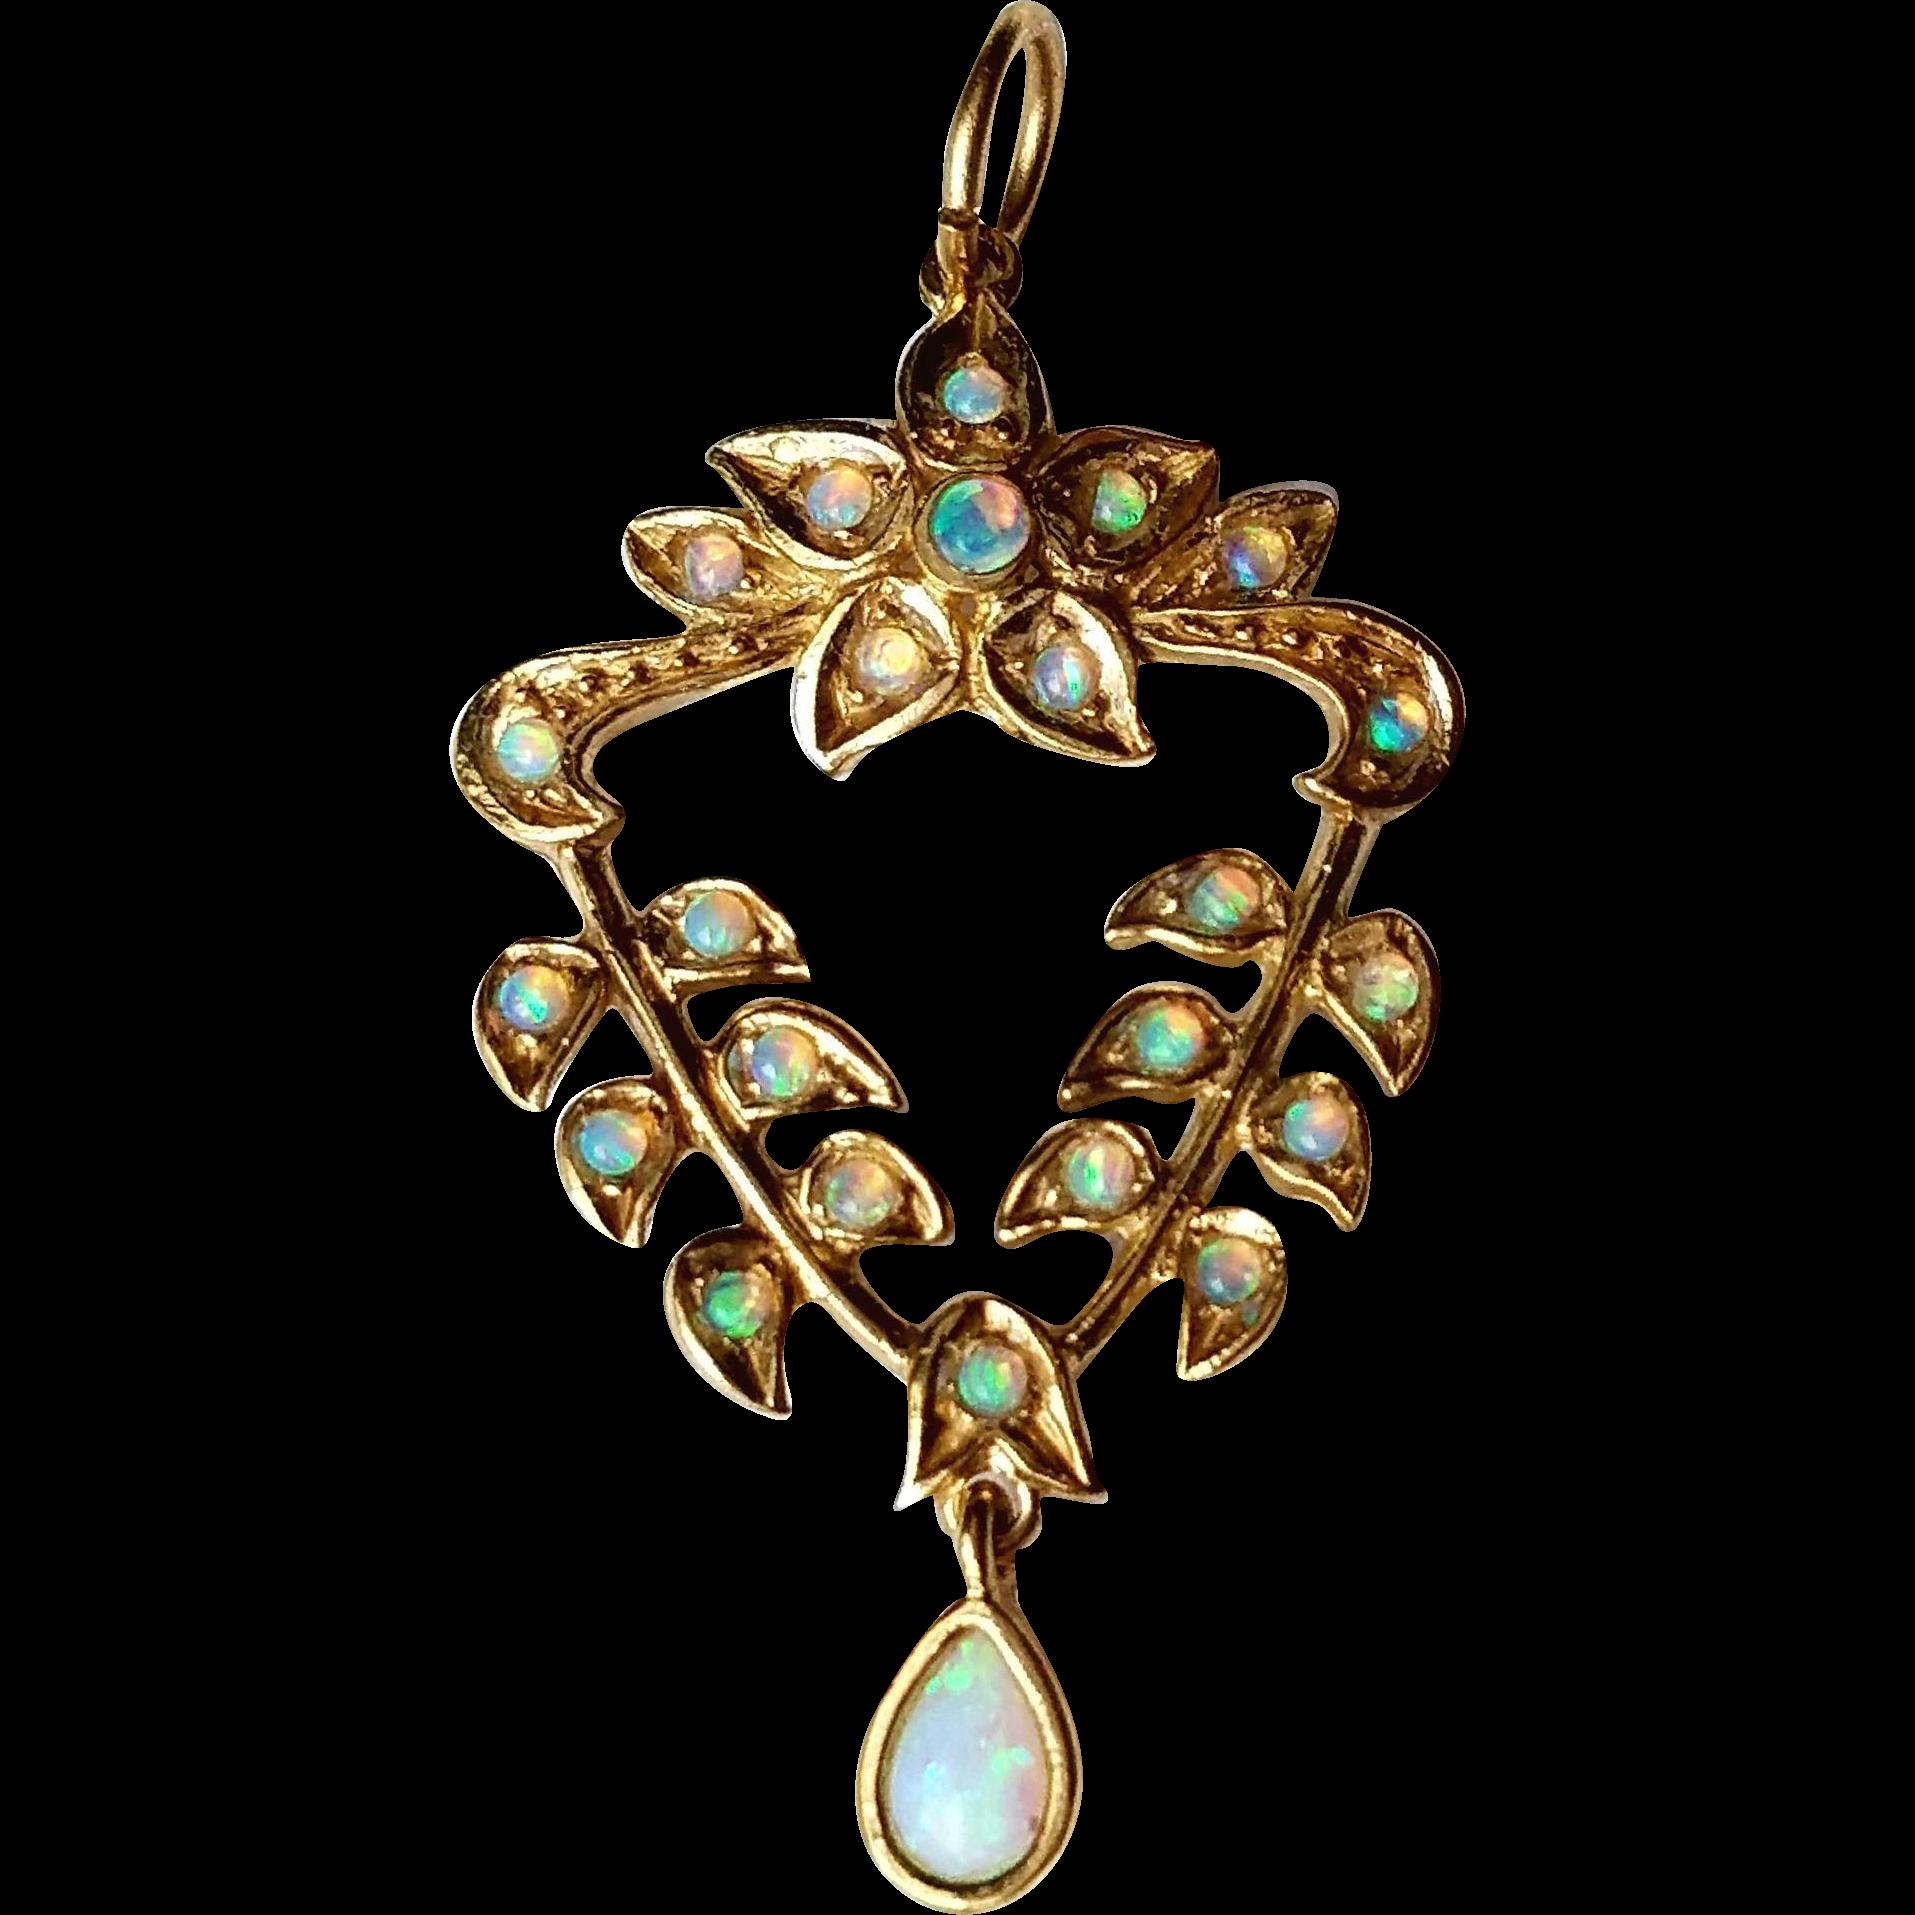 Vintage Jelly Opal English Lavalier Pendant 9K Gold Charm